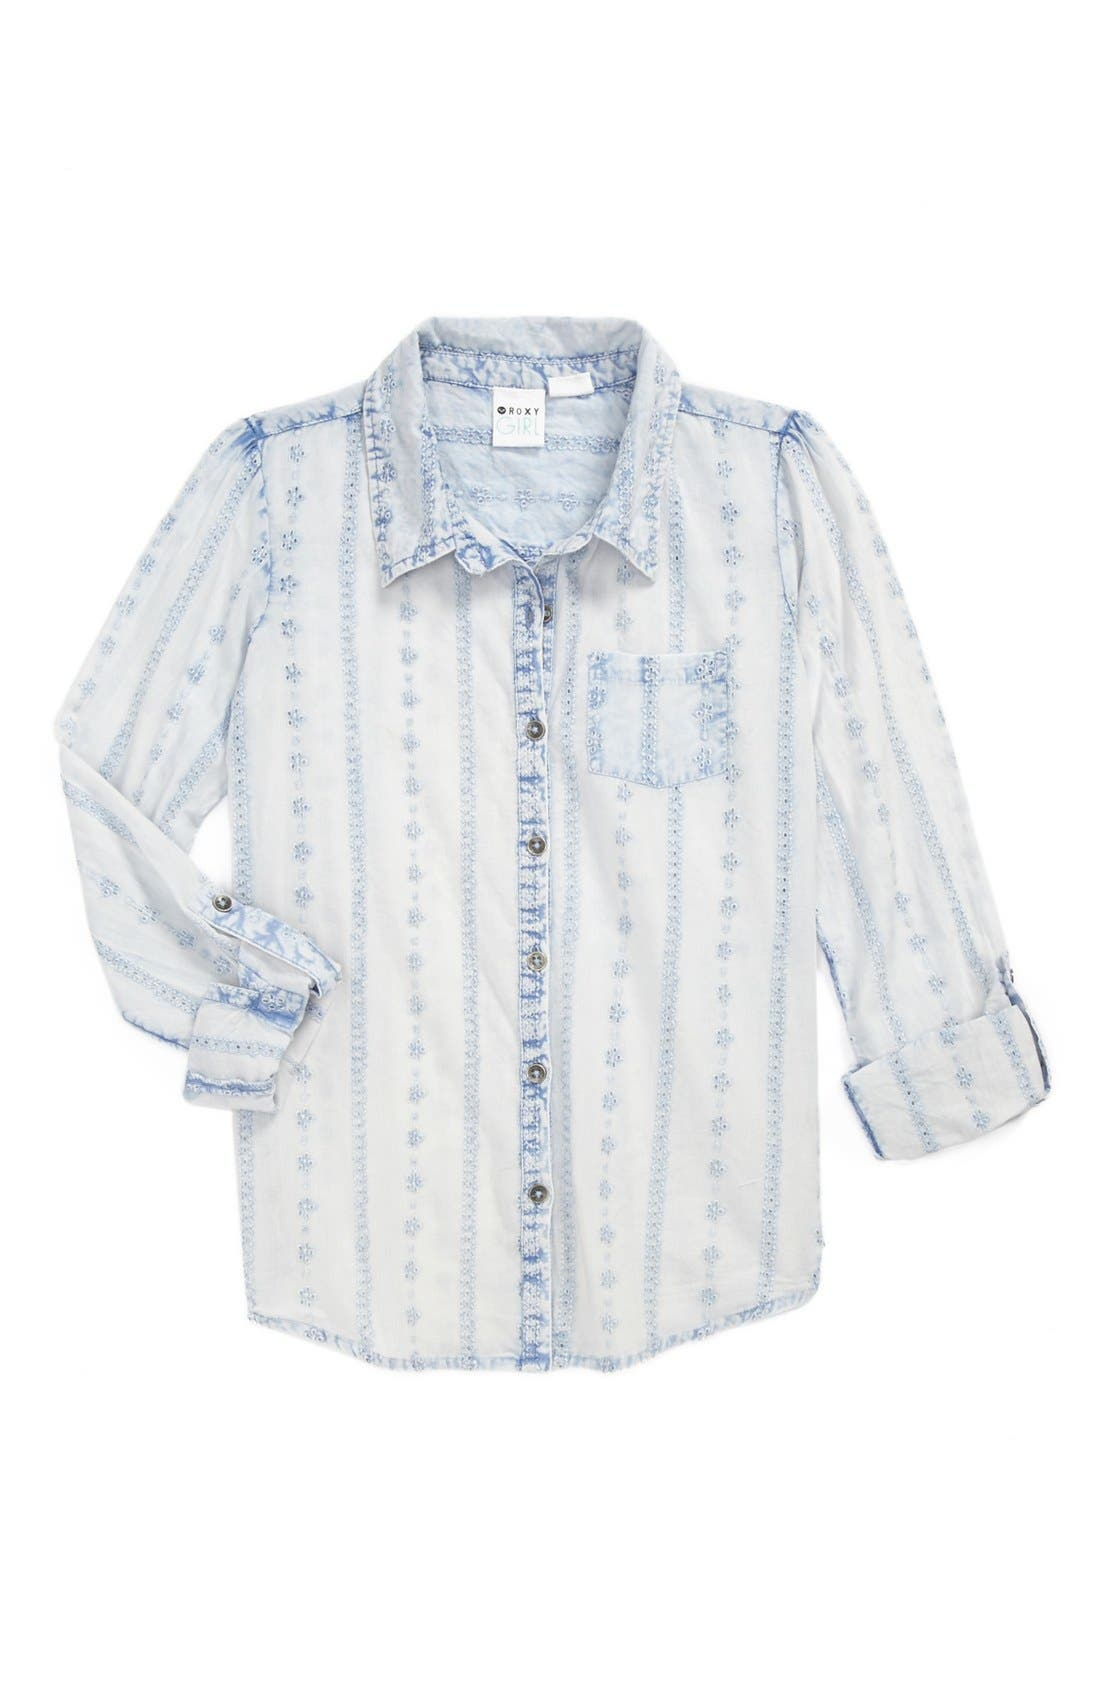 Main Image - 'Wise Up' Washed Woven Shirt (Big Girls)